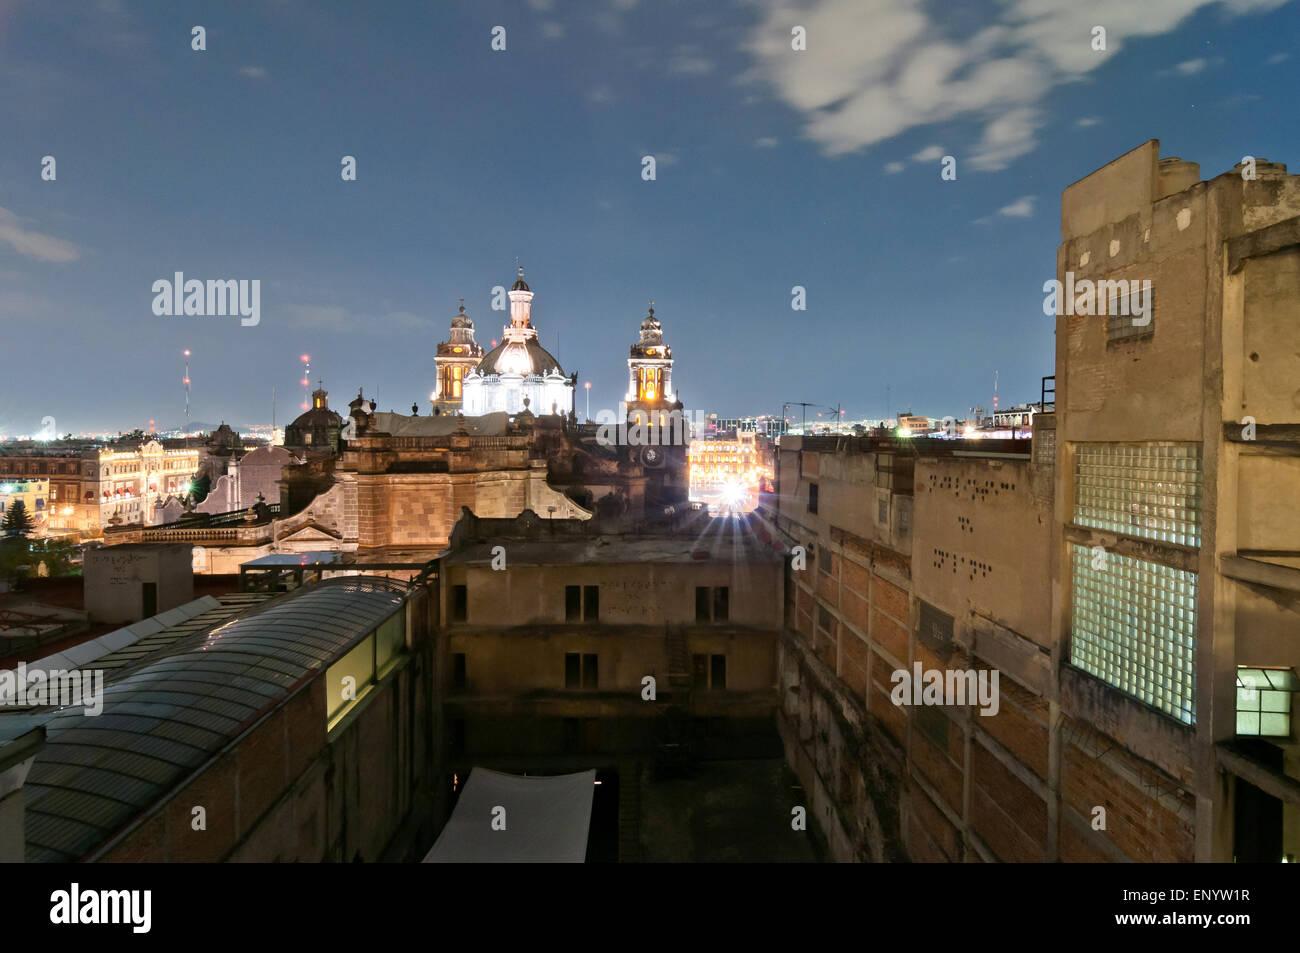 Ciudad de México, México - Abril 29, 2014: vista nocturna del skyline con barrios suburbanos iluminadas Imagen De Stock